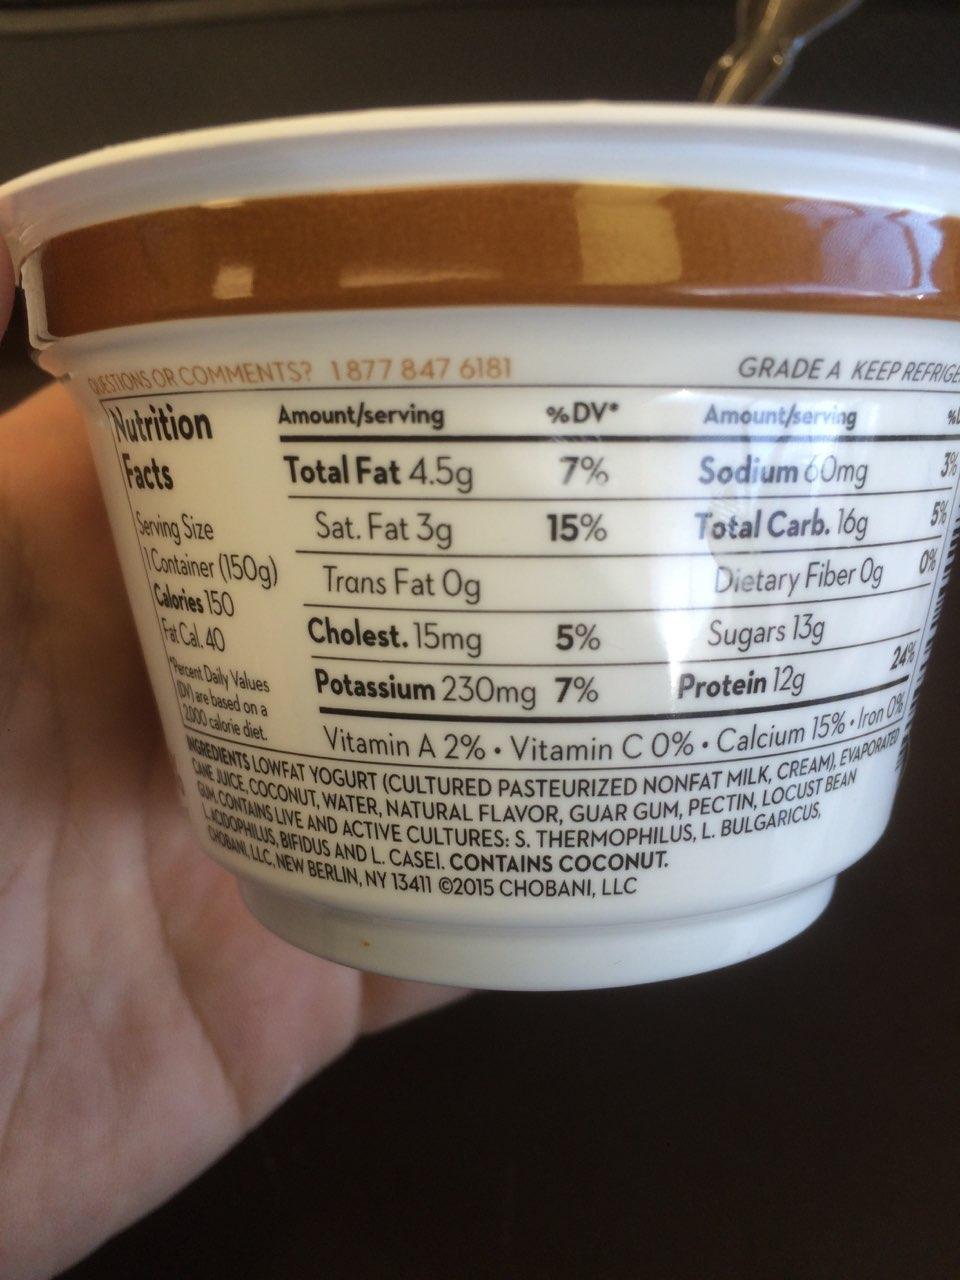 Chobani Greek Yogurt, Blended, Coconut